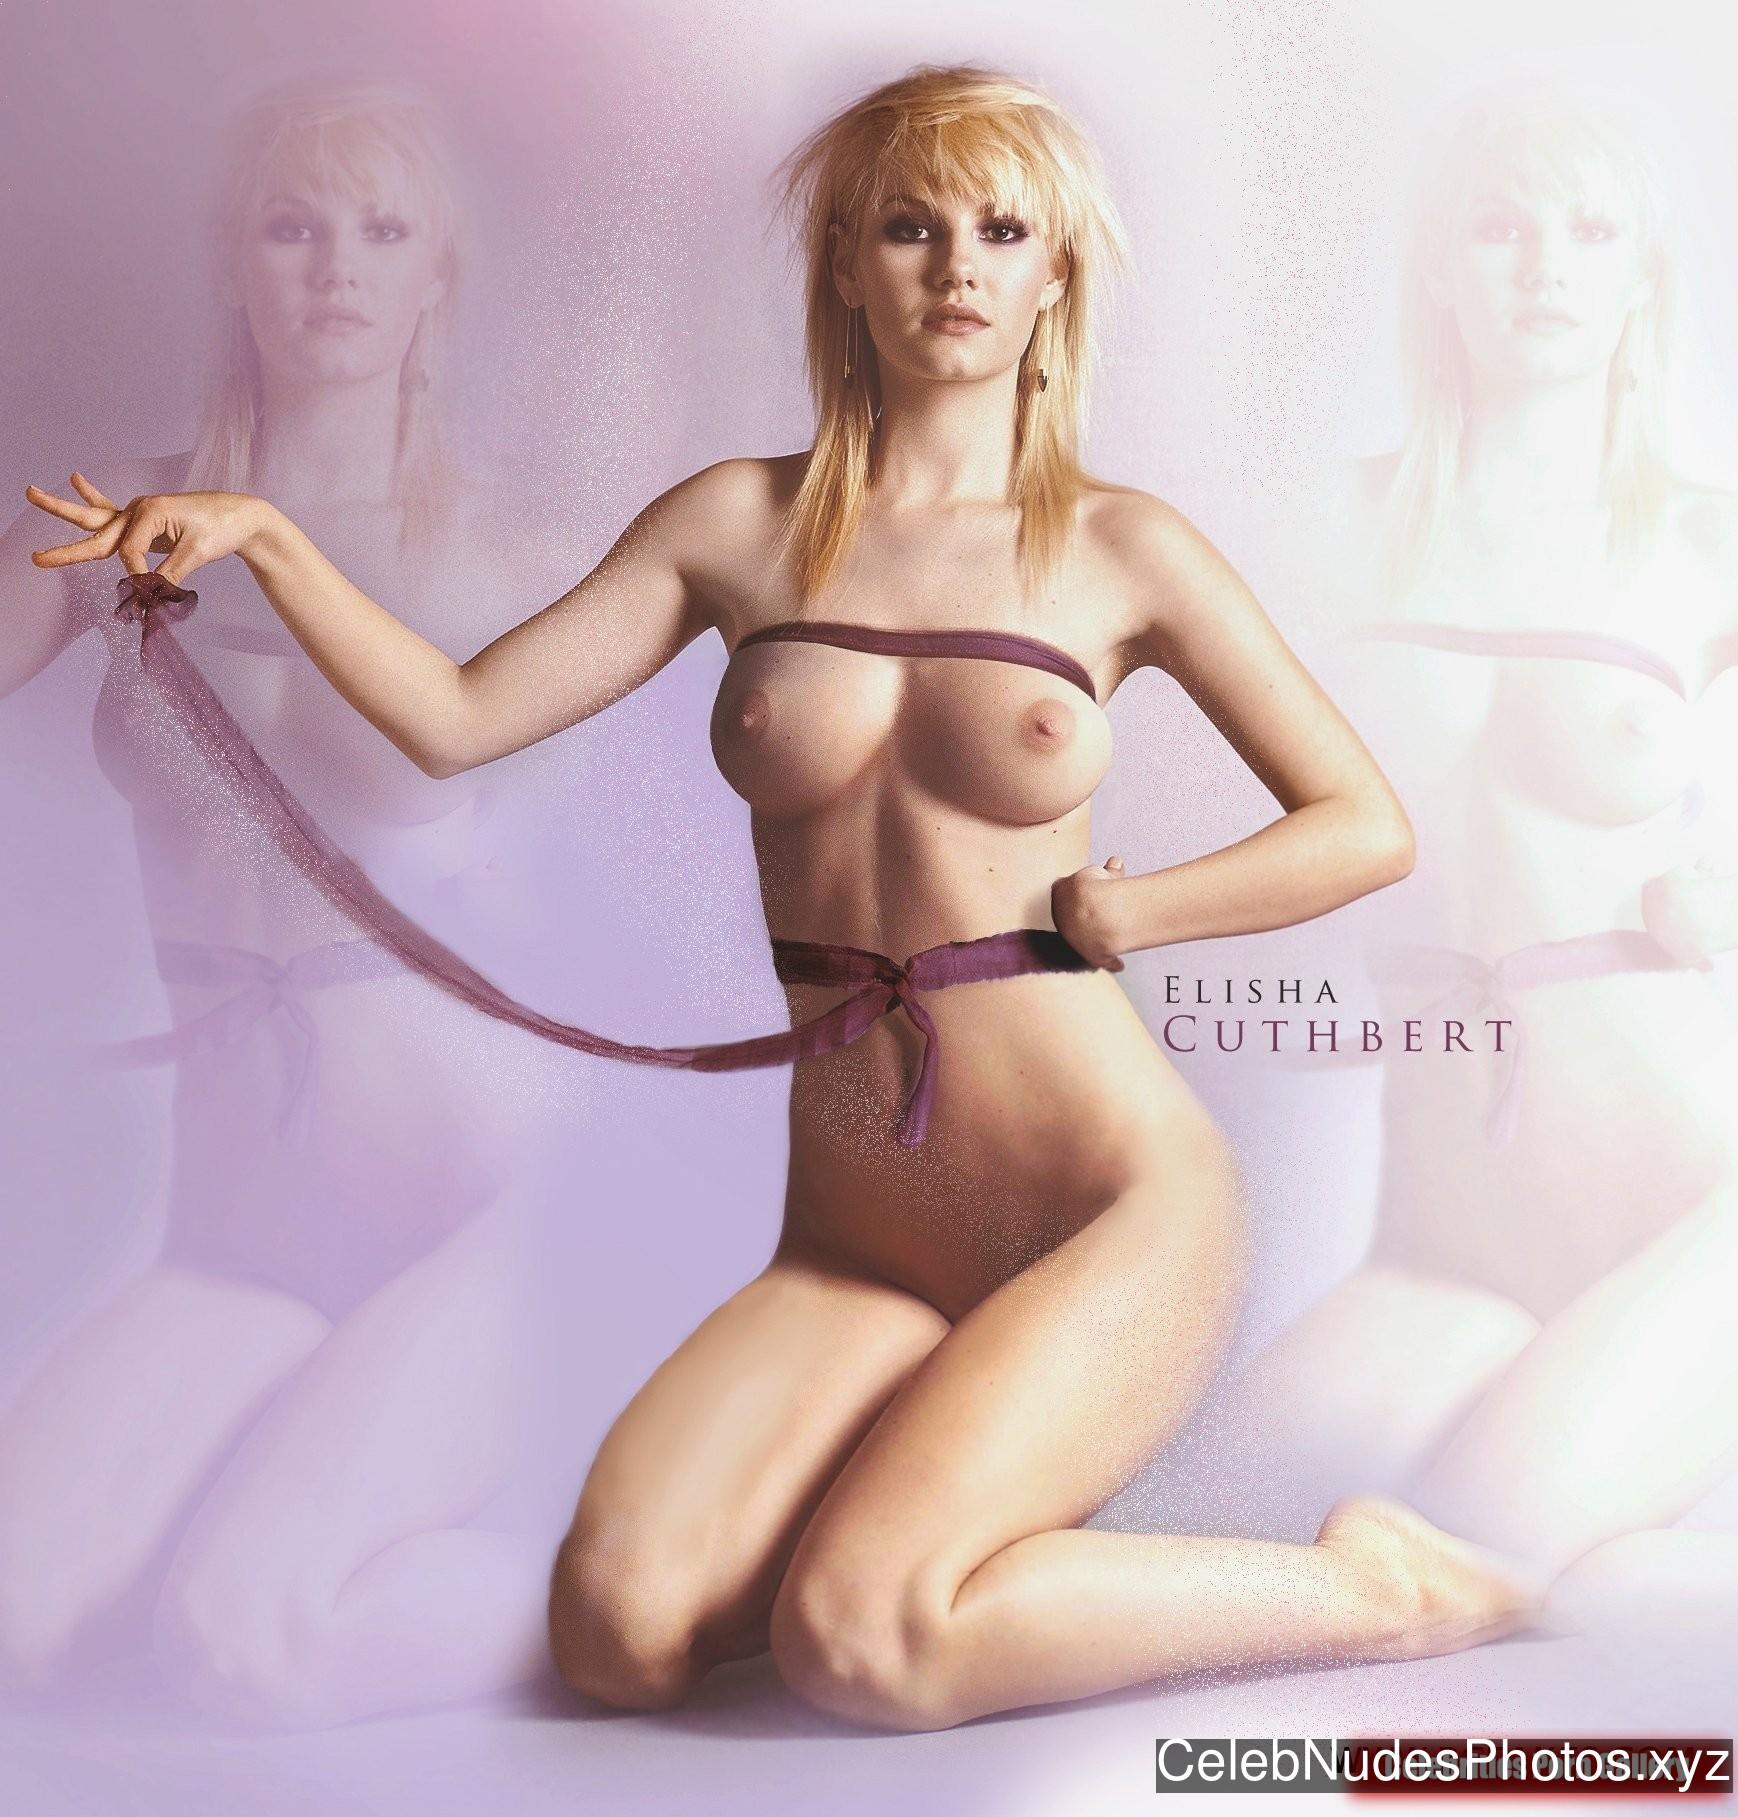 Elisha Cuthbert naked